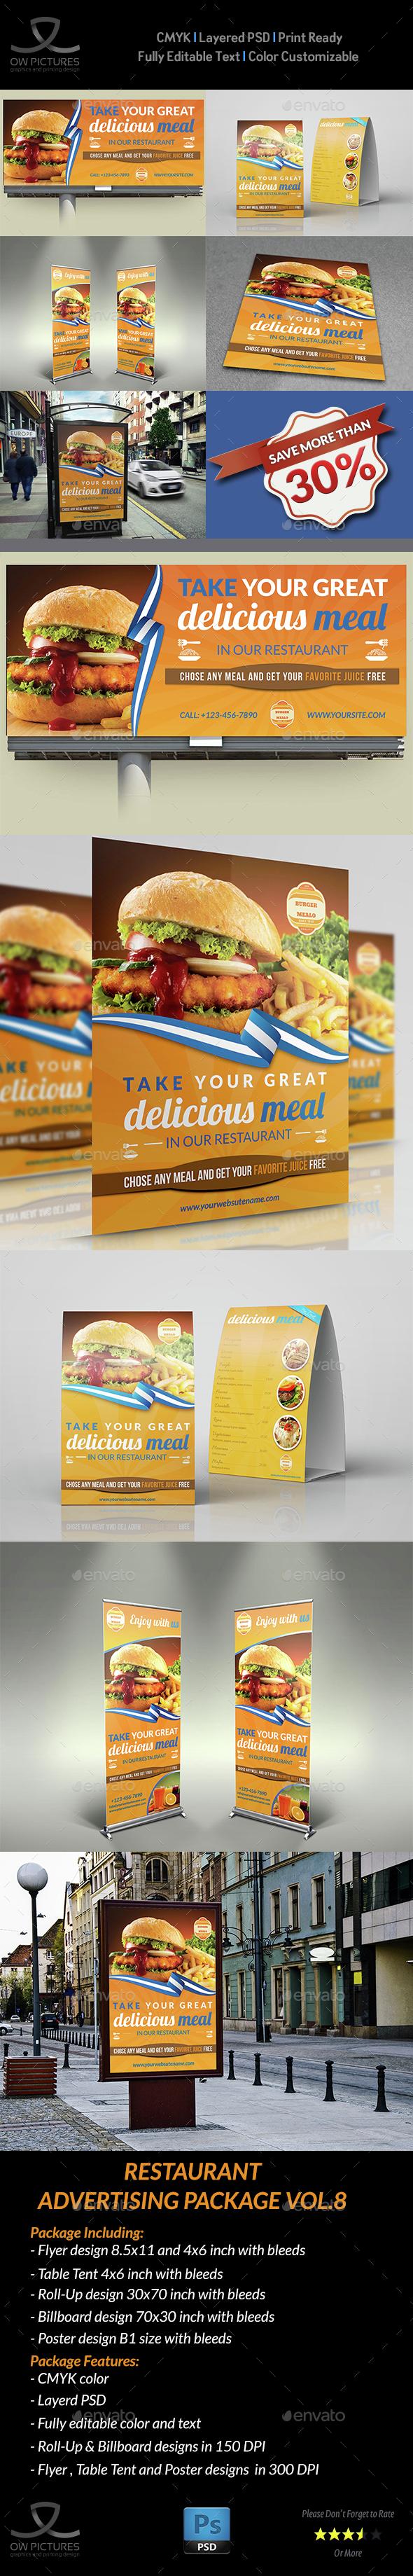 Restaurant Advertising Bundle Template Vol.8 - Signage Print Templates